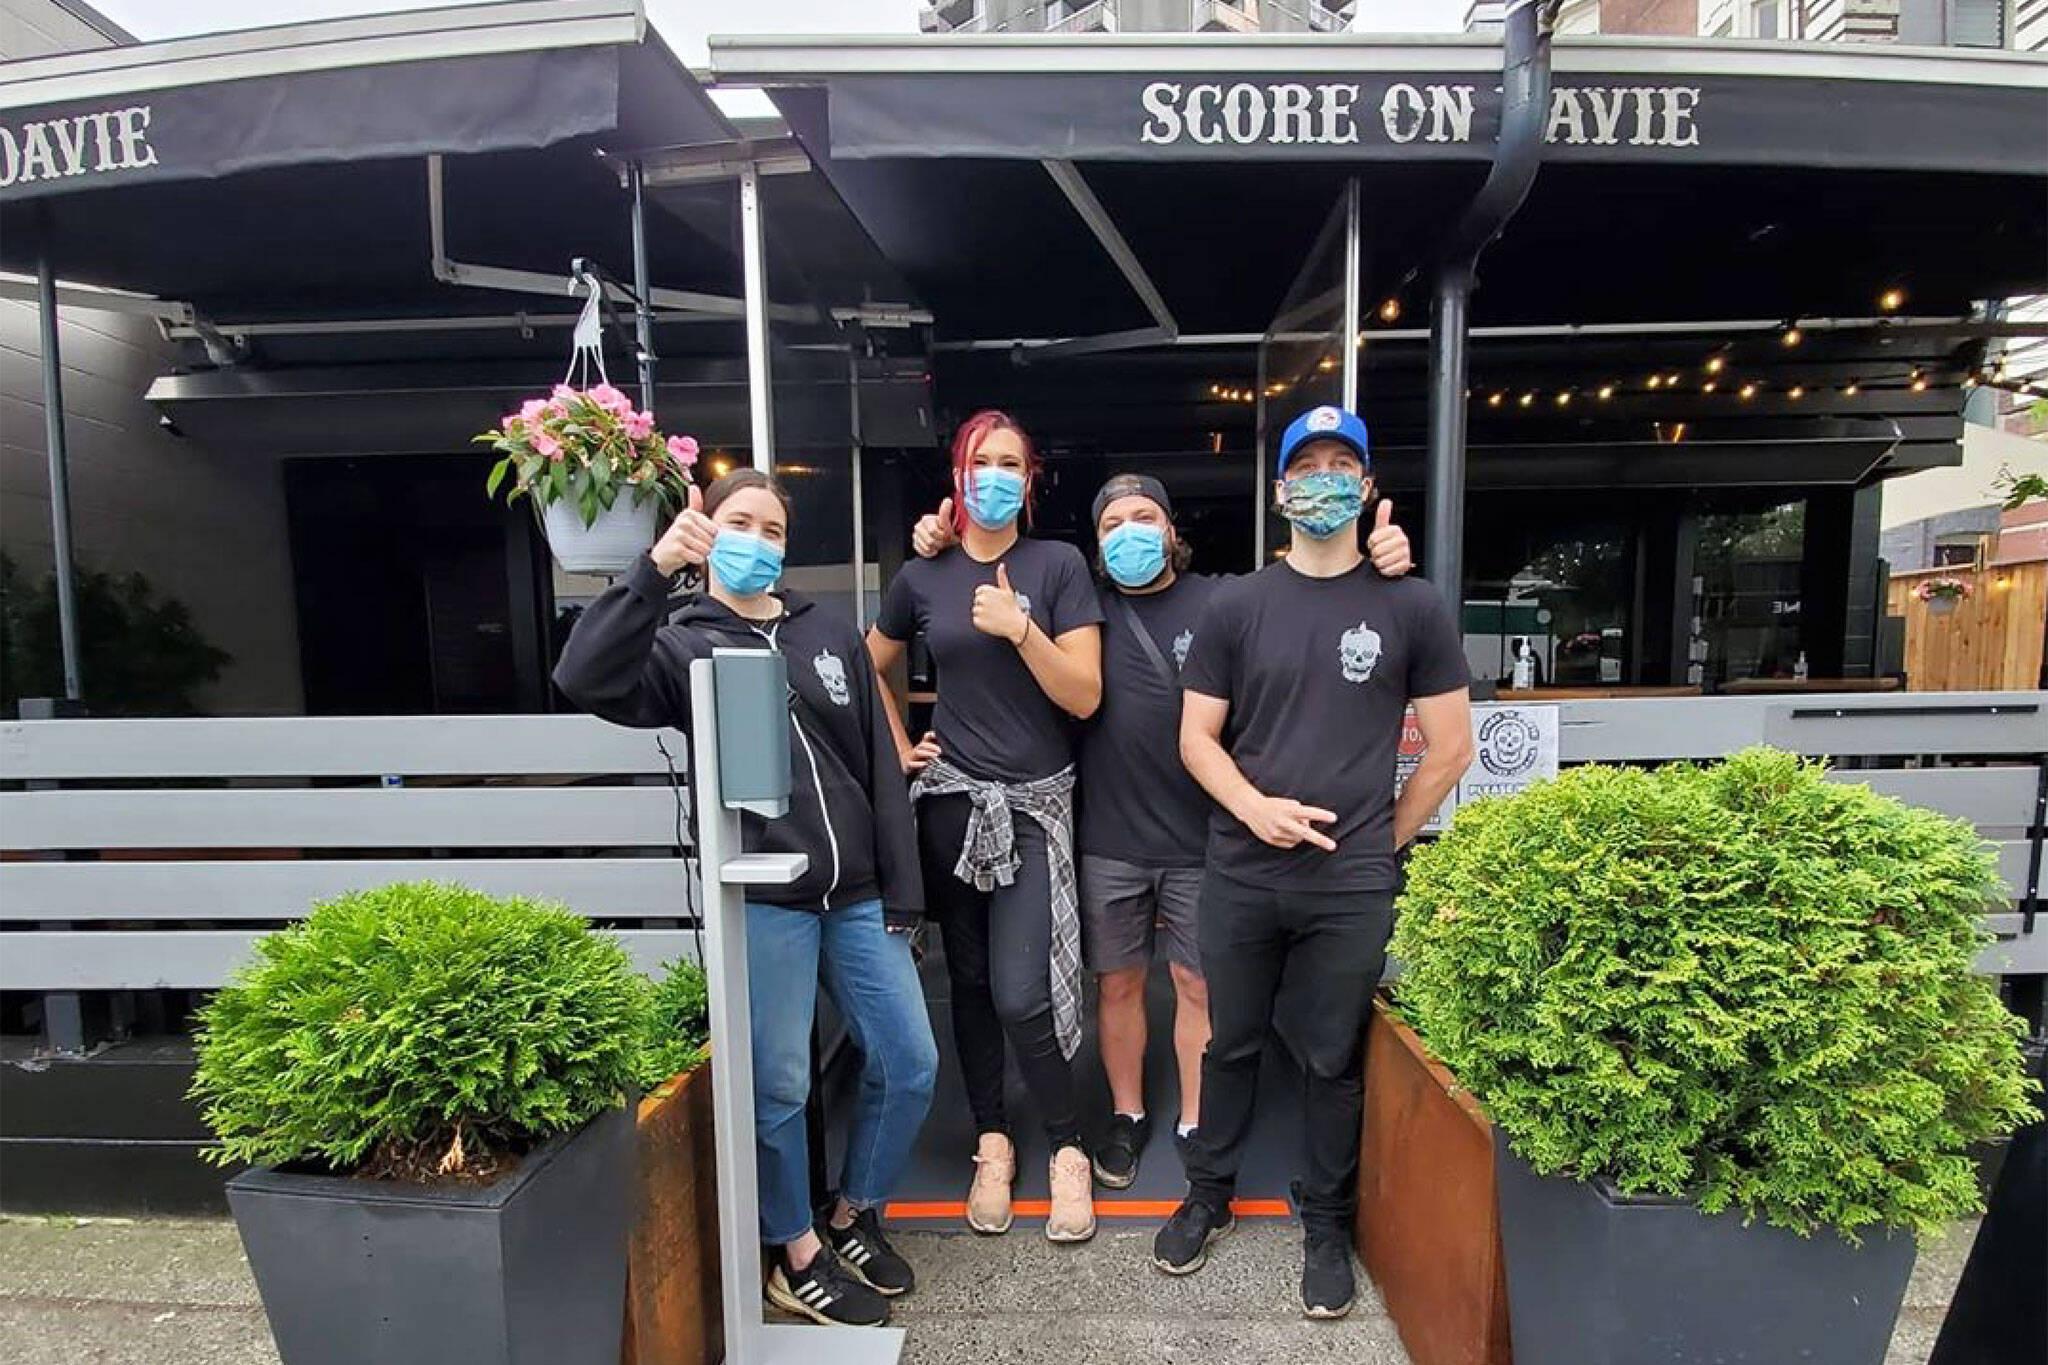 vancouver restaurants open for dine in